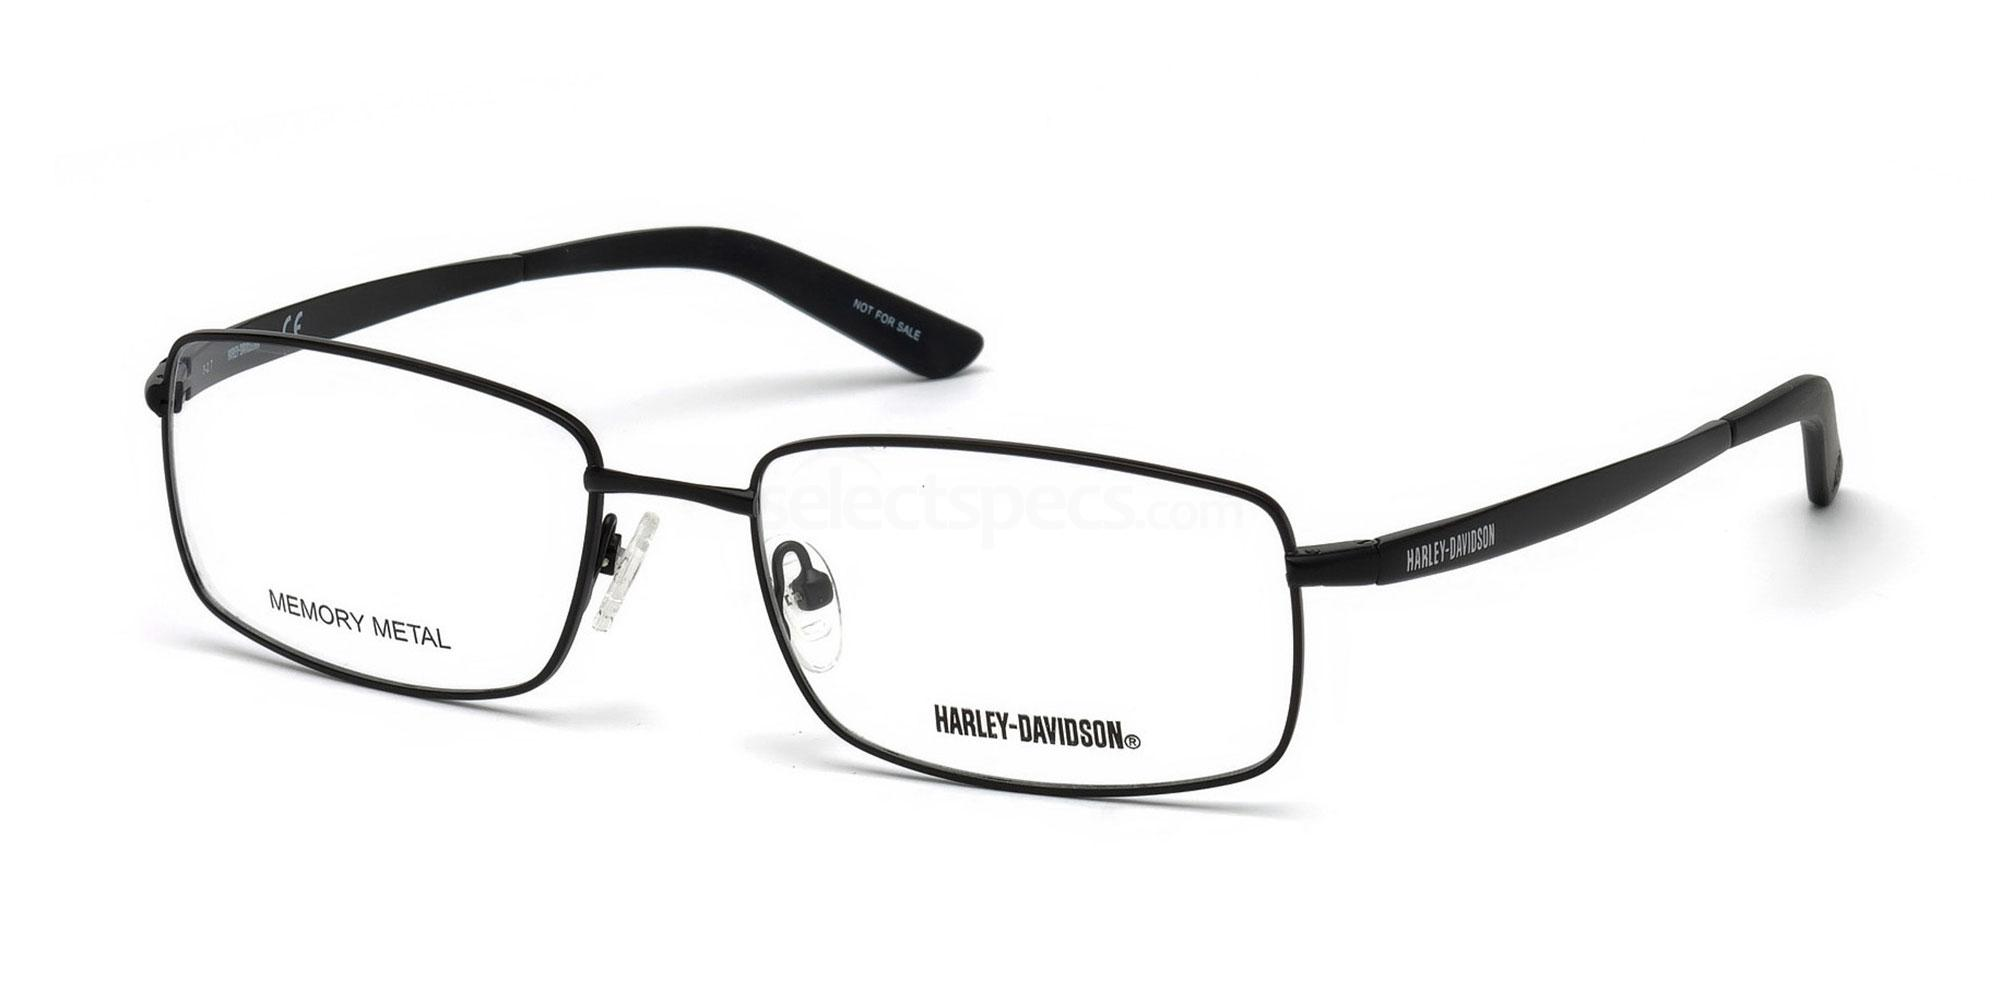 002 HD0769 Glasses, Harley Davidson